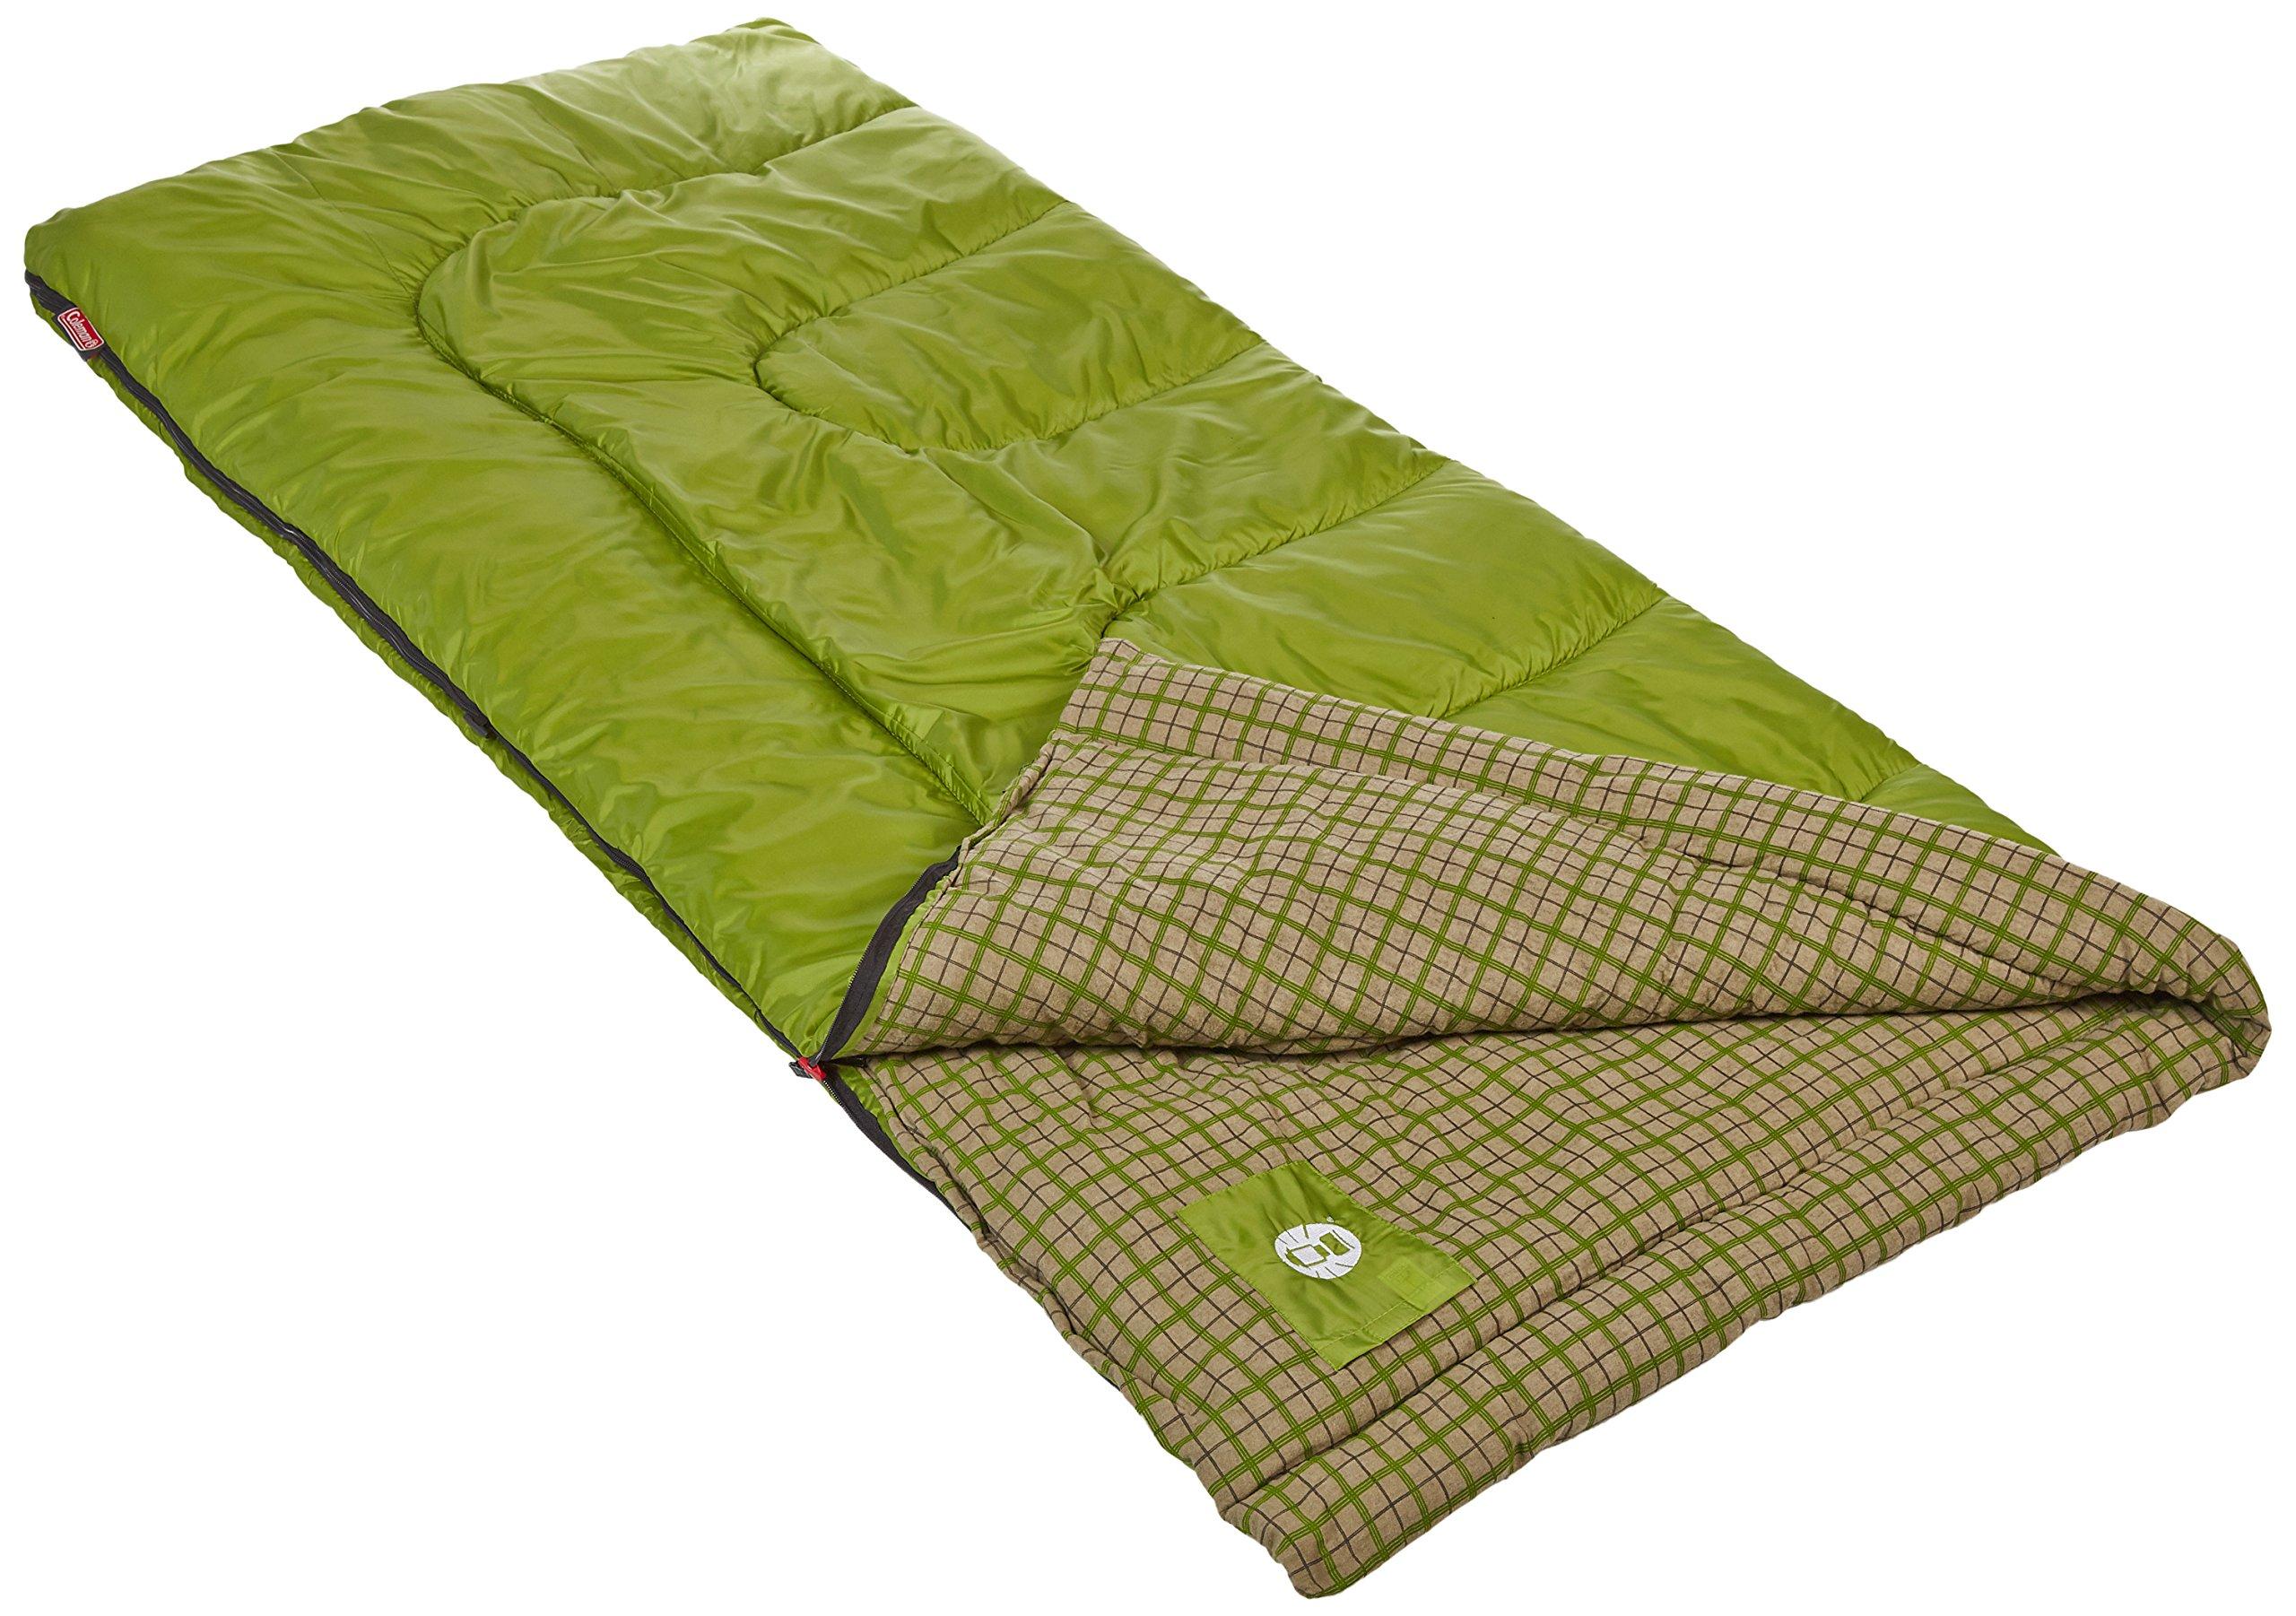 Coleman Green Valley 30 Degree Sleeping Bag 4